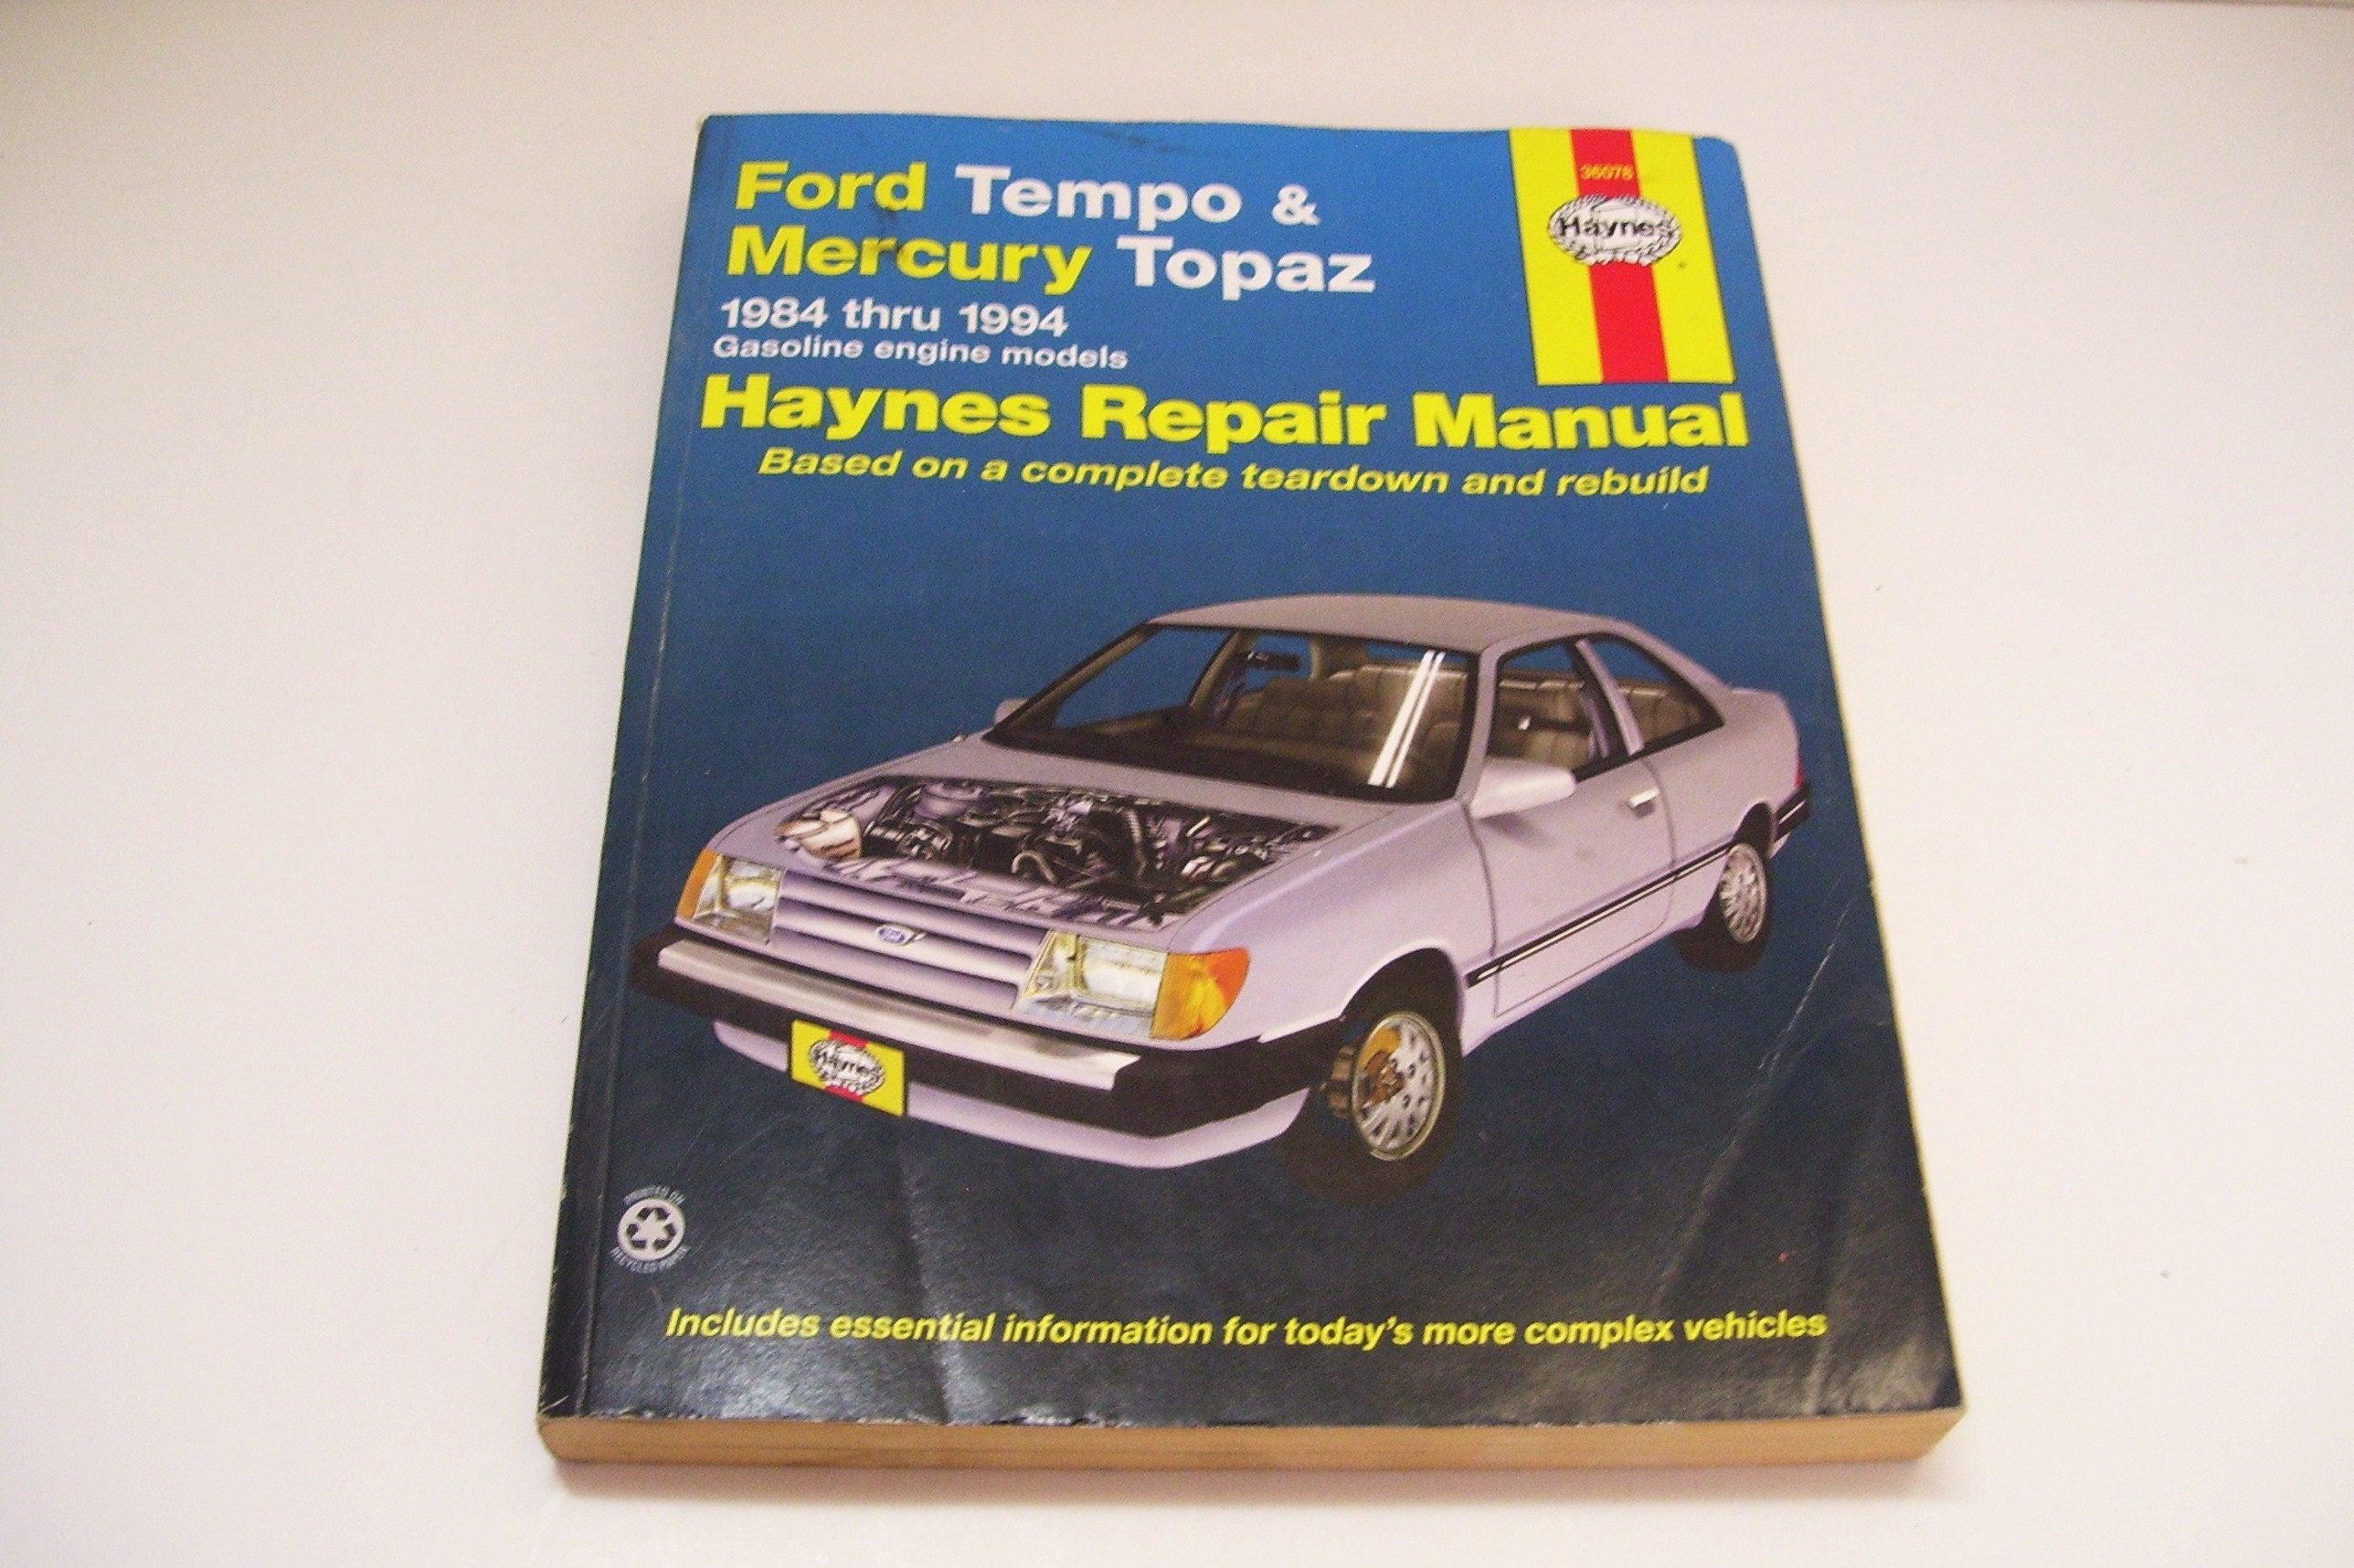 1994 Ford Tempo Haynes Repair Manual 1986 Fuse Box And Mercury Topaz 1984 Etsy Rh Com Problems